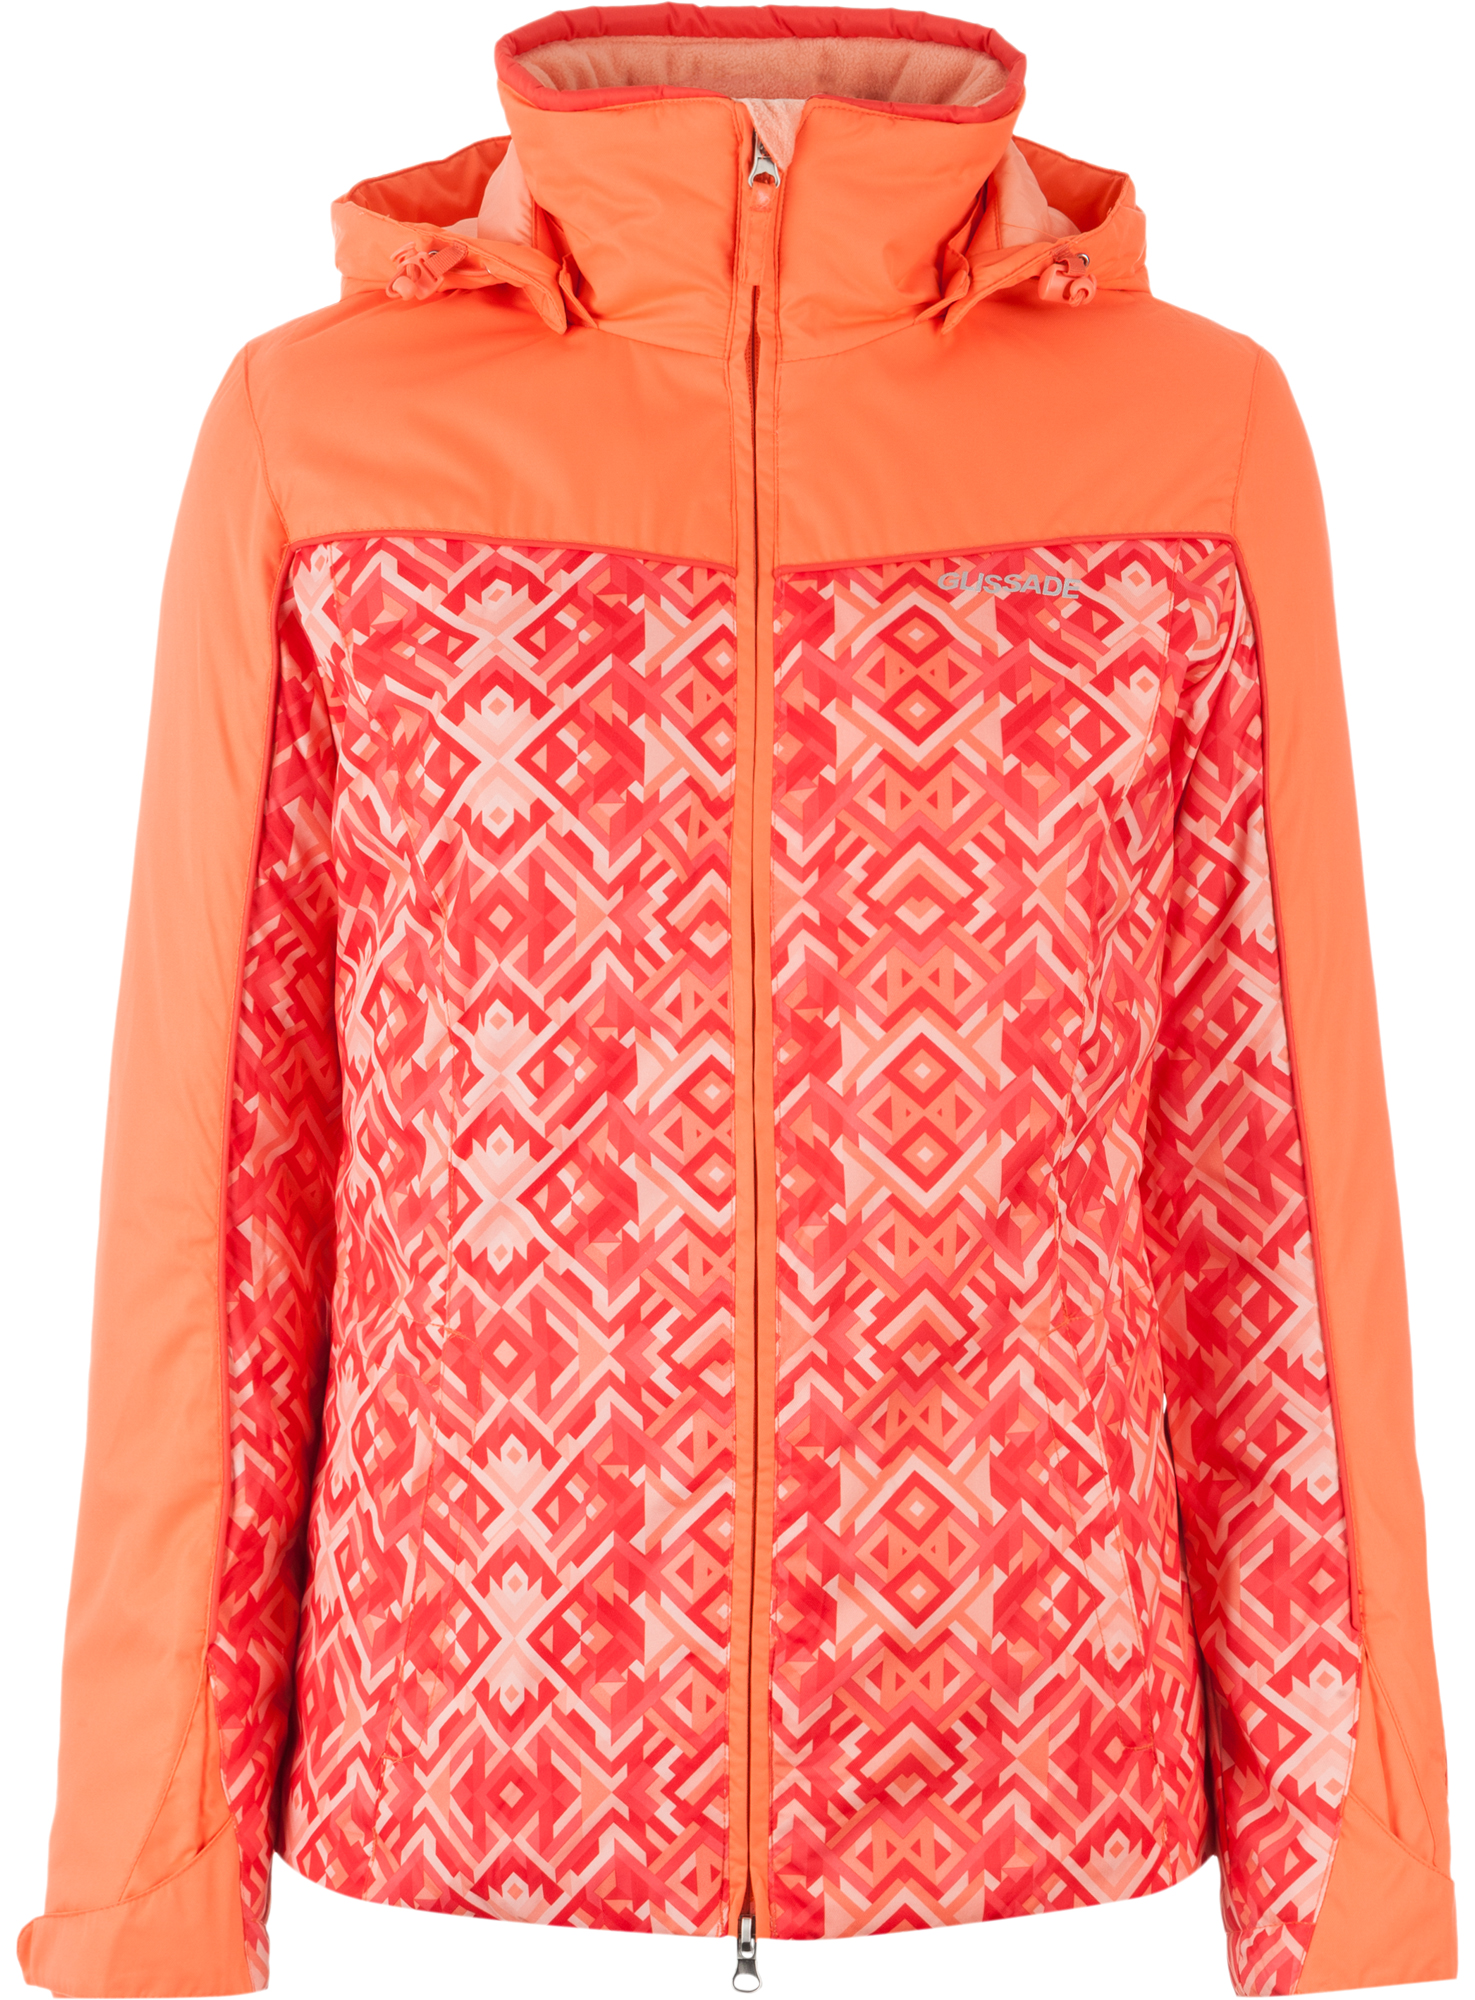 цена Glissade Куртка утепленная женская Glissade, размер 44 онлайн в 2017 году